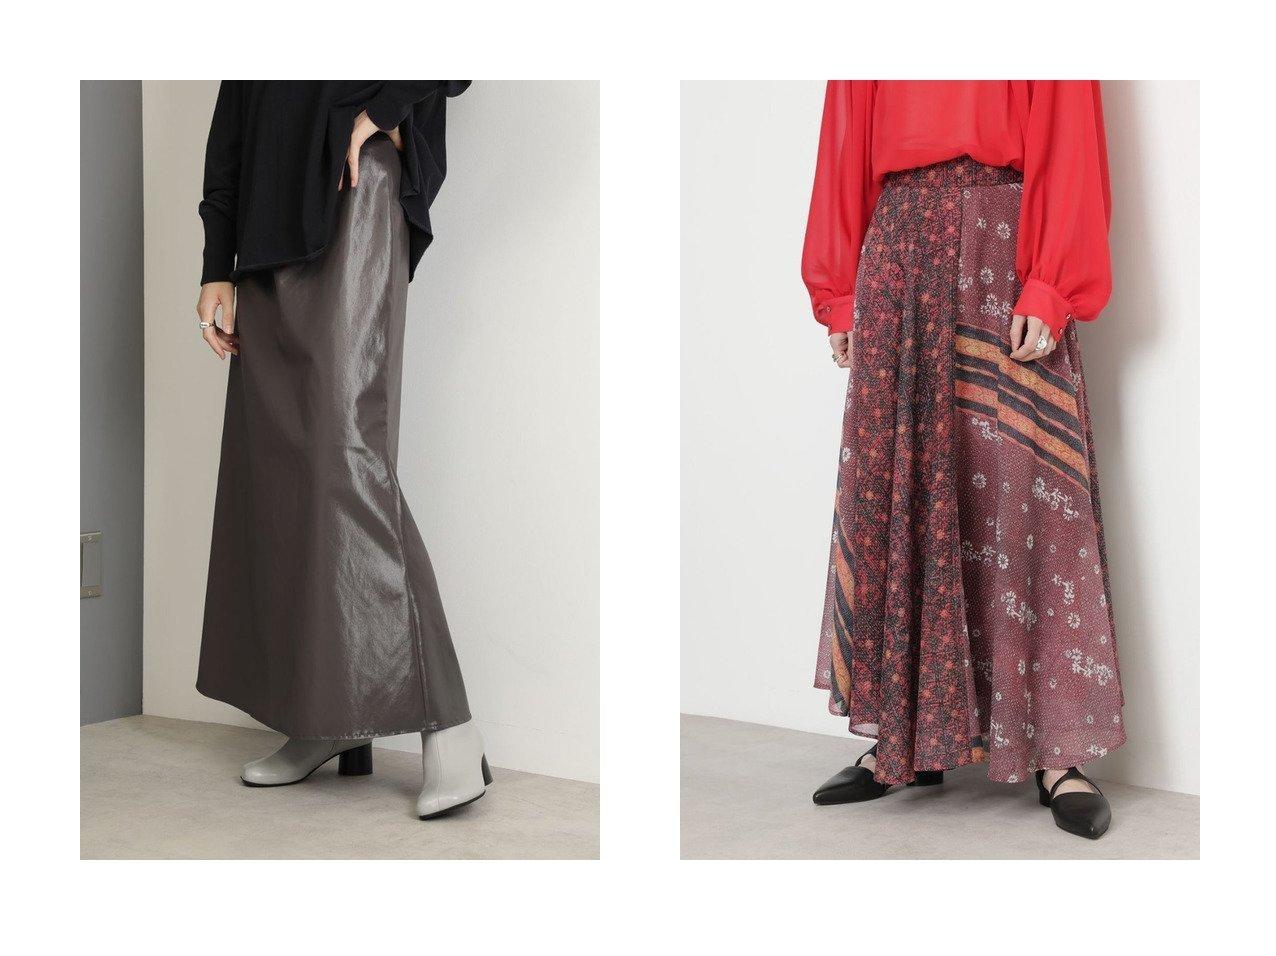 【ROSE BUD/ローズバッド】のマーメイドスカート&キルトプリントスカート 【スカート】おすすめ!人気、トレンド・レディースファッションの通販   おすすめで人気の流行・トレンド、ファッションの通販商品 インテリア・家具・メンズファッション・キッズファッション・レディースファッション・服の通販 founy(ファニー) https://founy.com/ ファッション Fashion レディースファッション WOMEN スカート Skirt ロングスカート Long Skirt 2020年 2020 2020-2021秋冬・A/W AW・Autumn/Winter・FW・Fall-Winter/2020-2021 2021年 2021 2021-2022秋冬・A/W AW・Autumn/Winter・FW・Fall-Winter・2021-2022 A/W・秋冬 AW・Autumn/Winter・FW・Fall-Winter マーメイド ロング 定番 Standard キルト プリント マキシ ランダム  ID:crp329100000065911